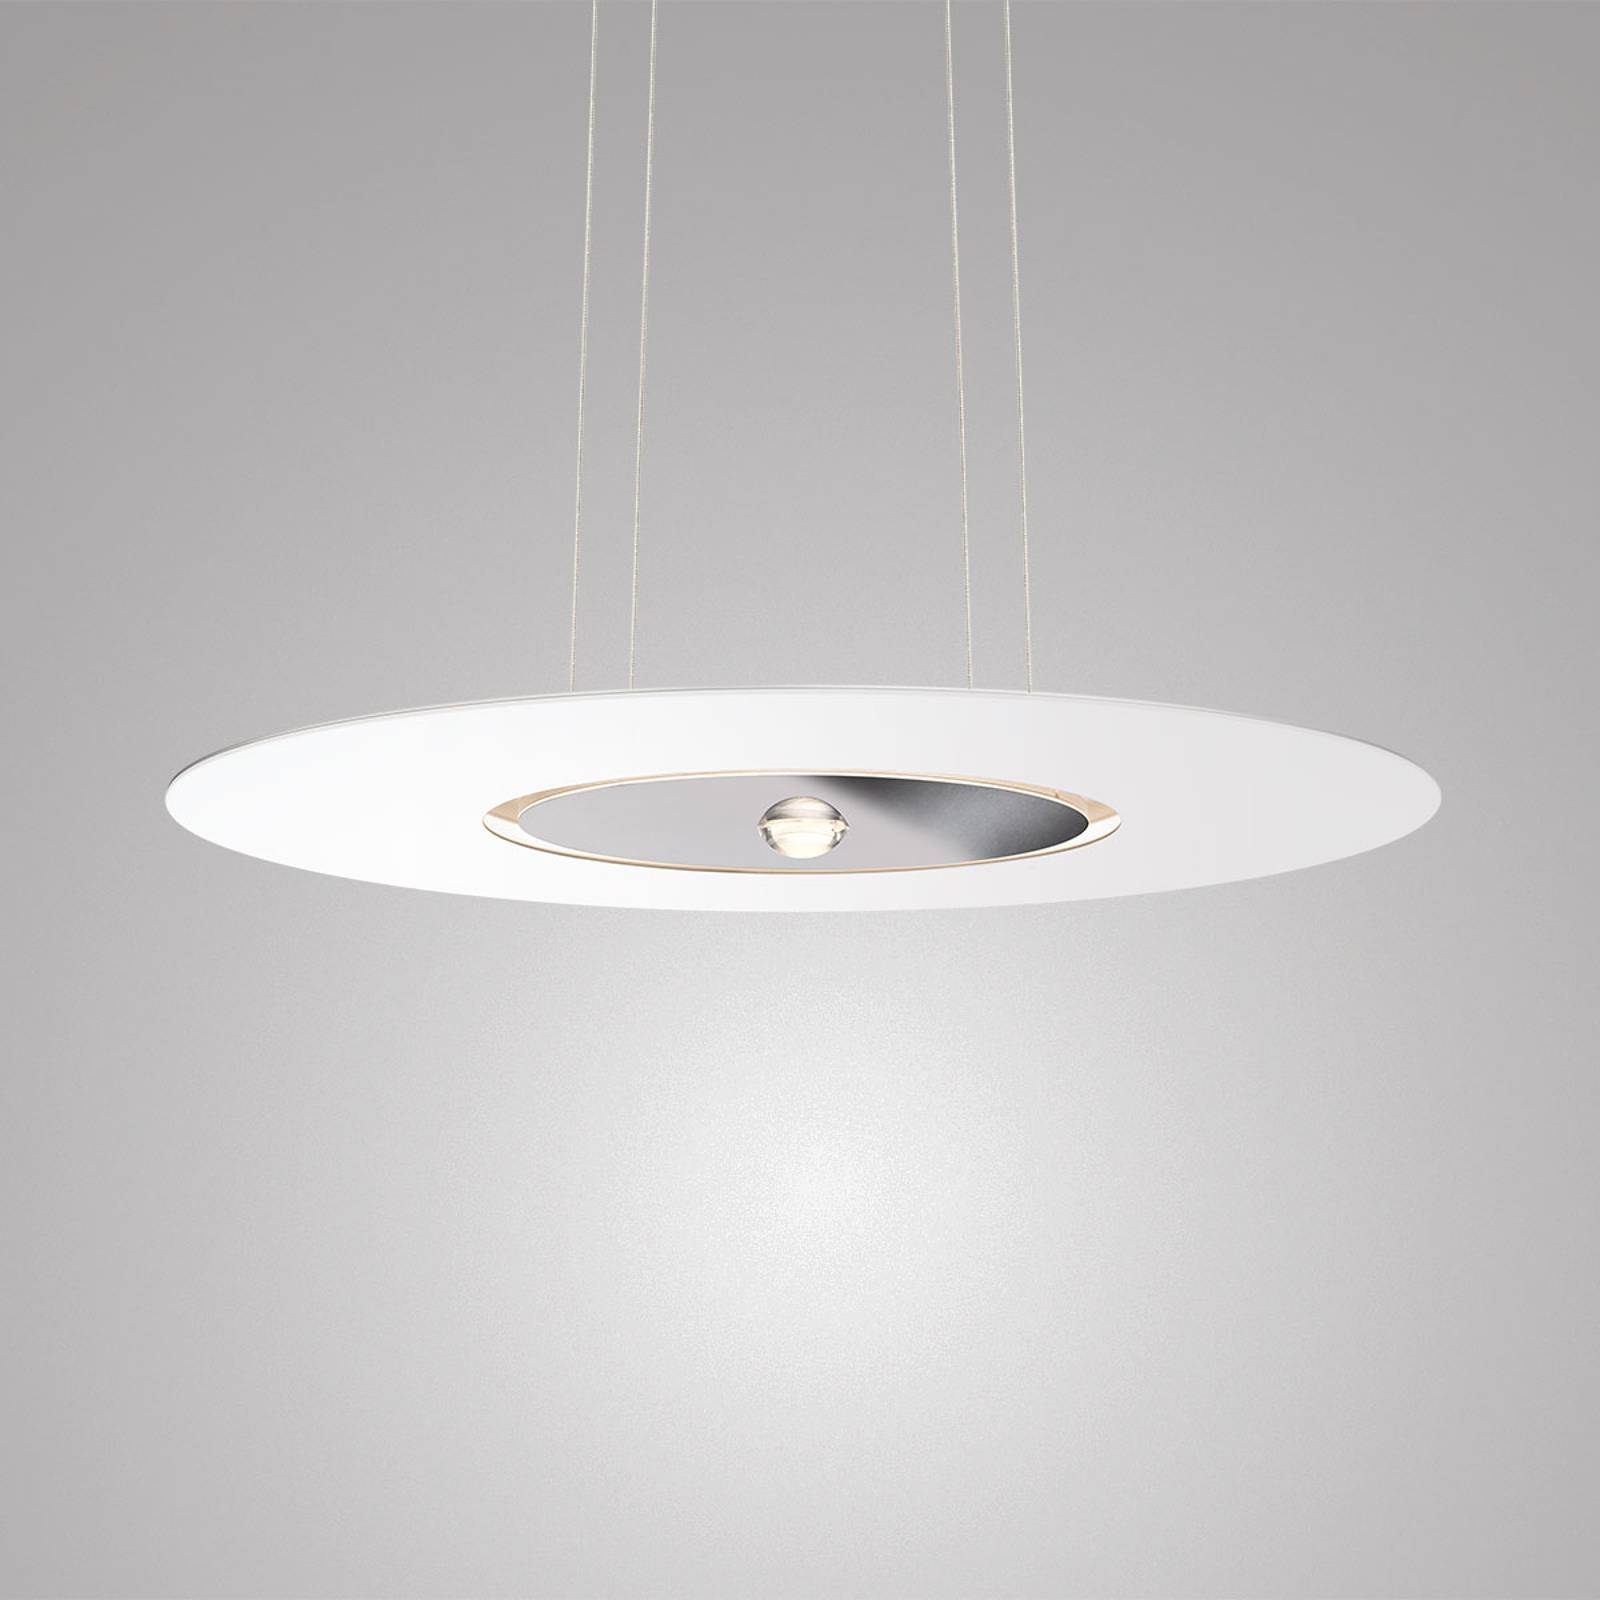 Cini&Nils Passepartout55 LED-riippuvalo Casambi